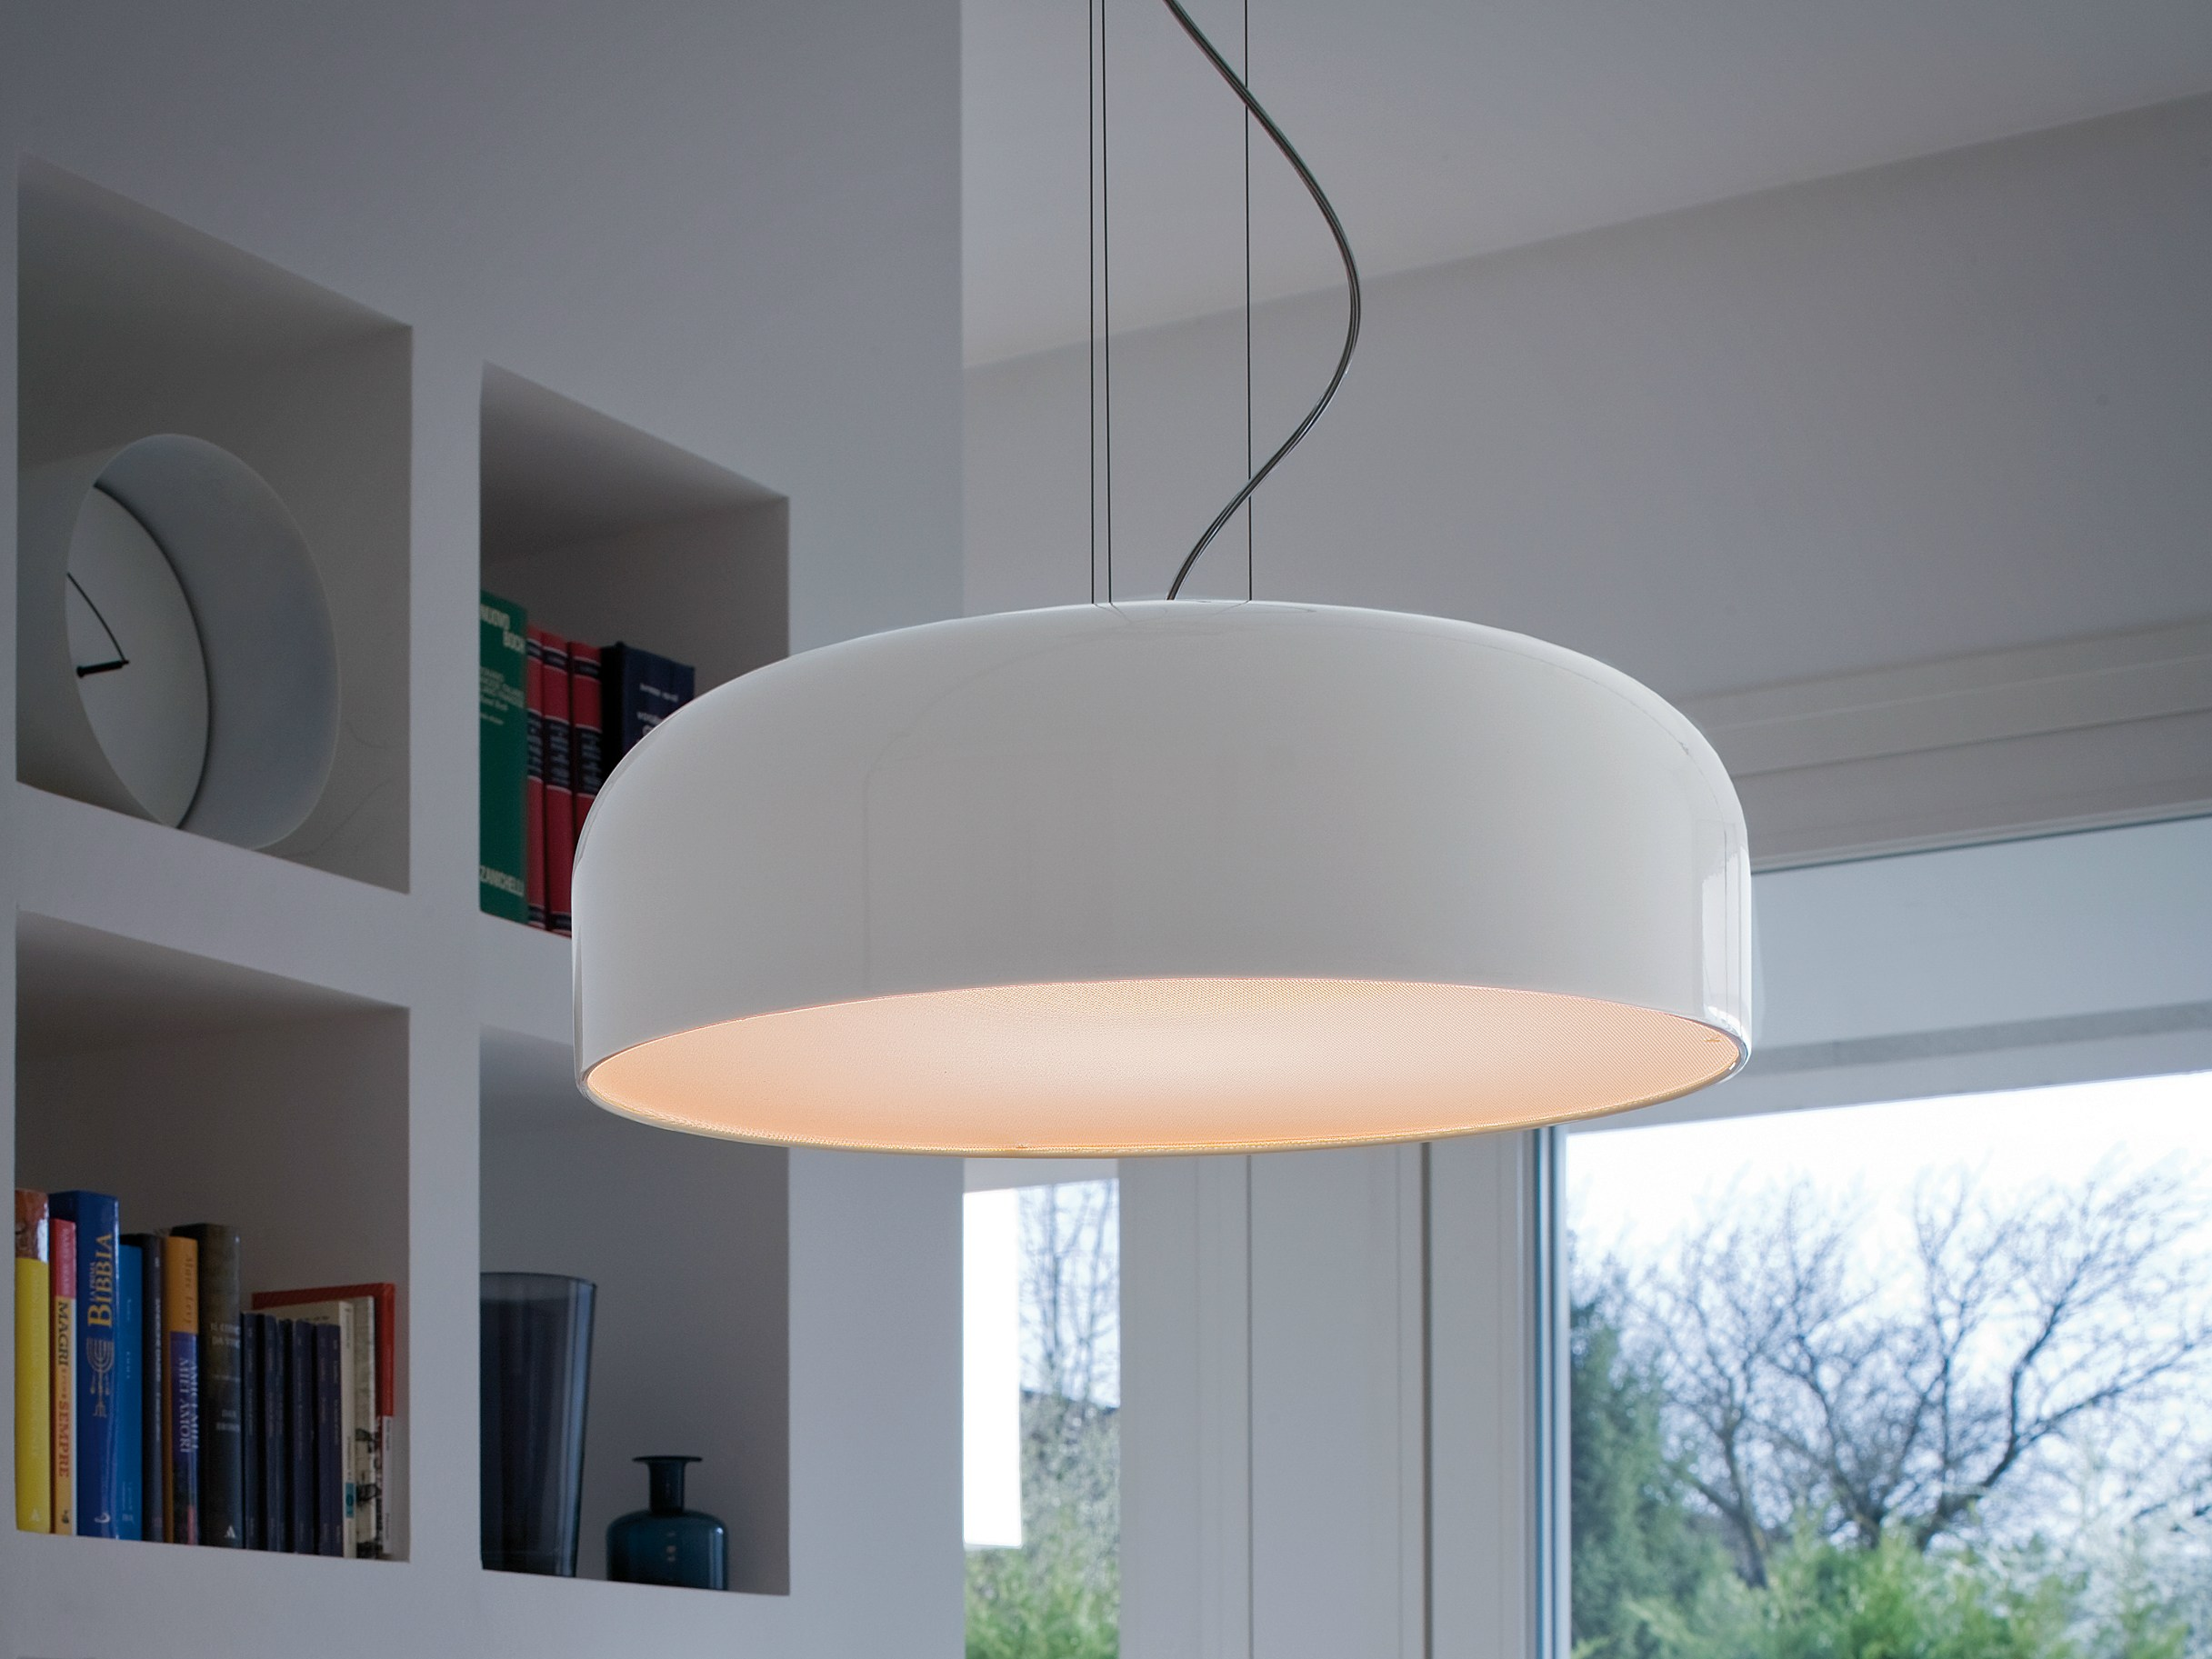 Lámpara colgante VITA By Lucente diseño Brian Rasmussen